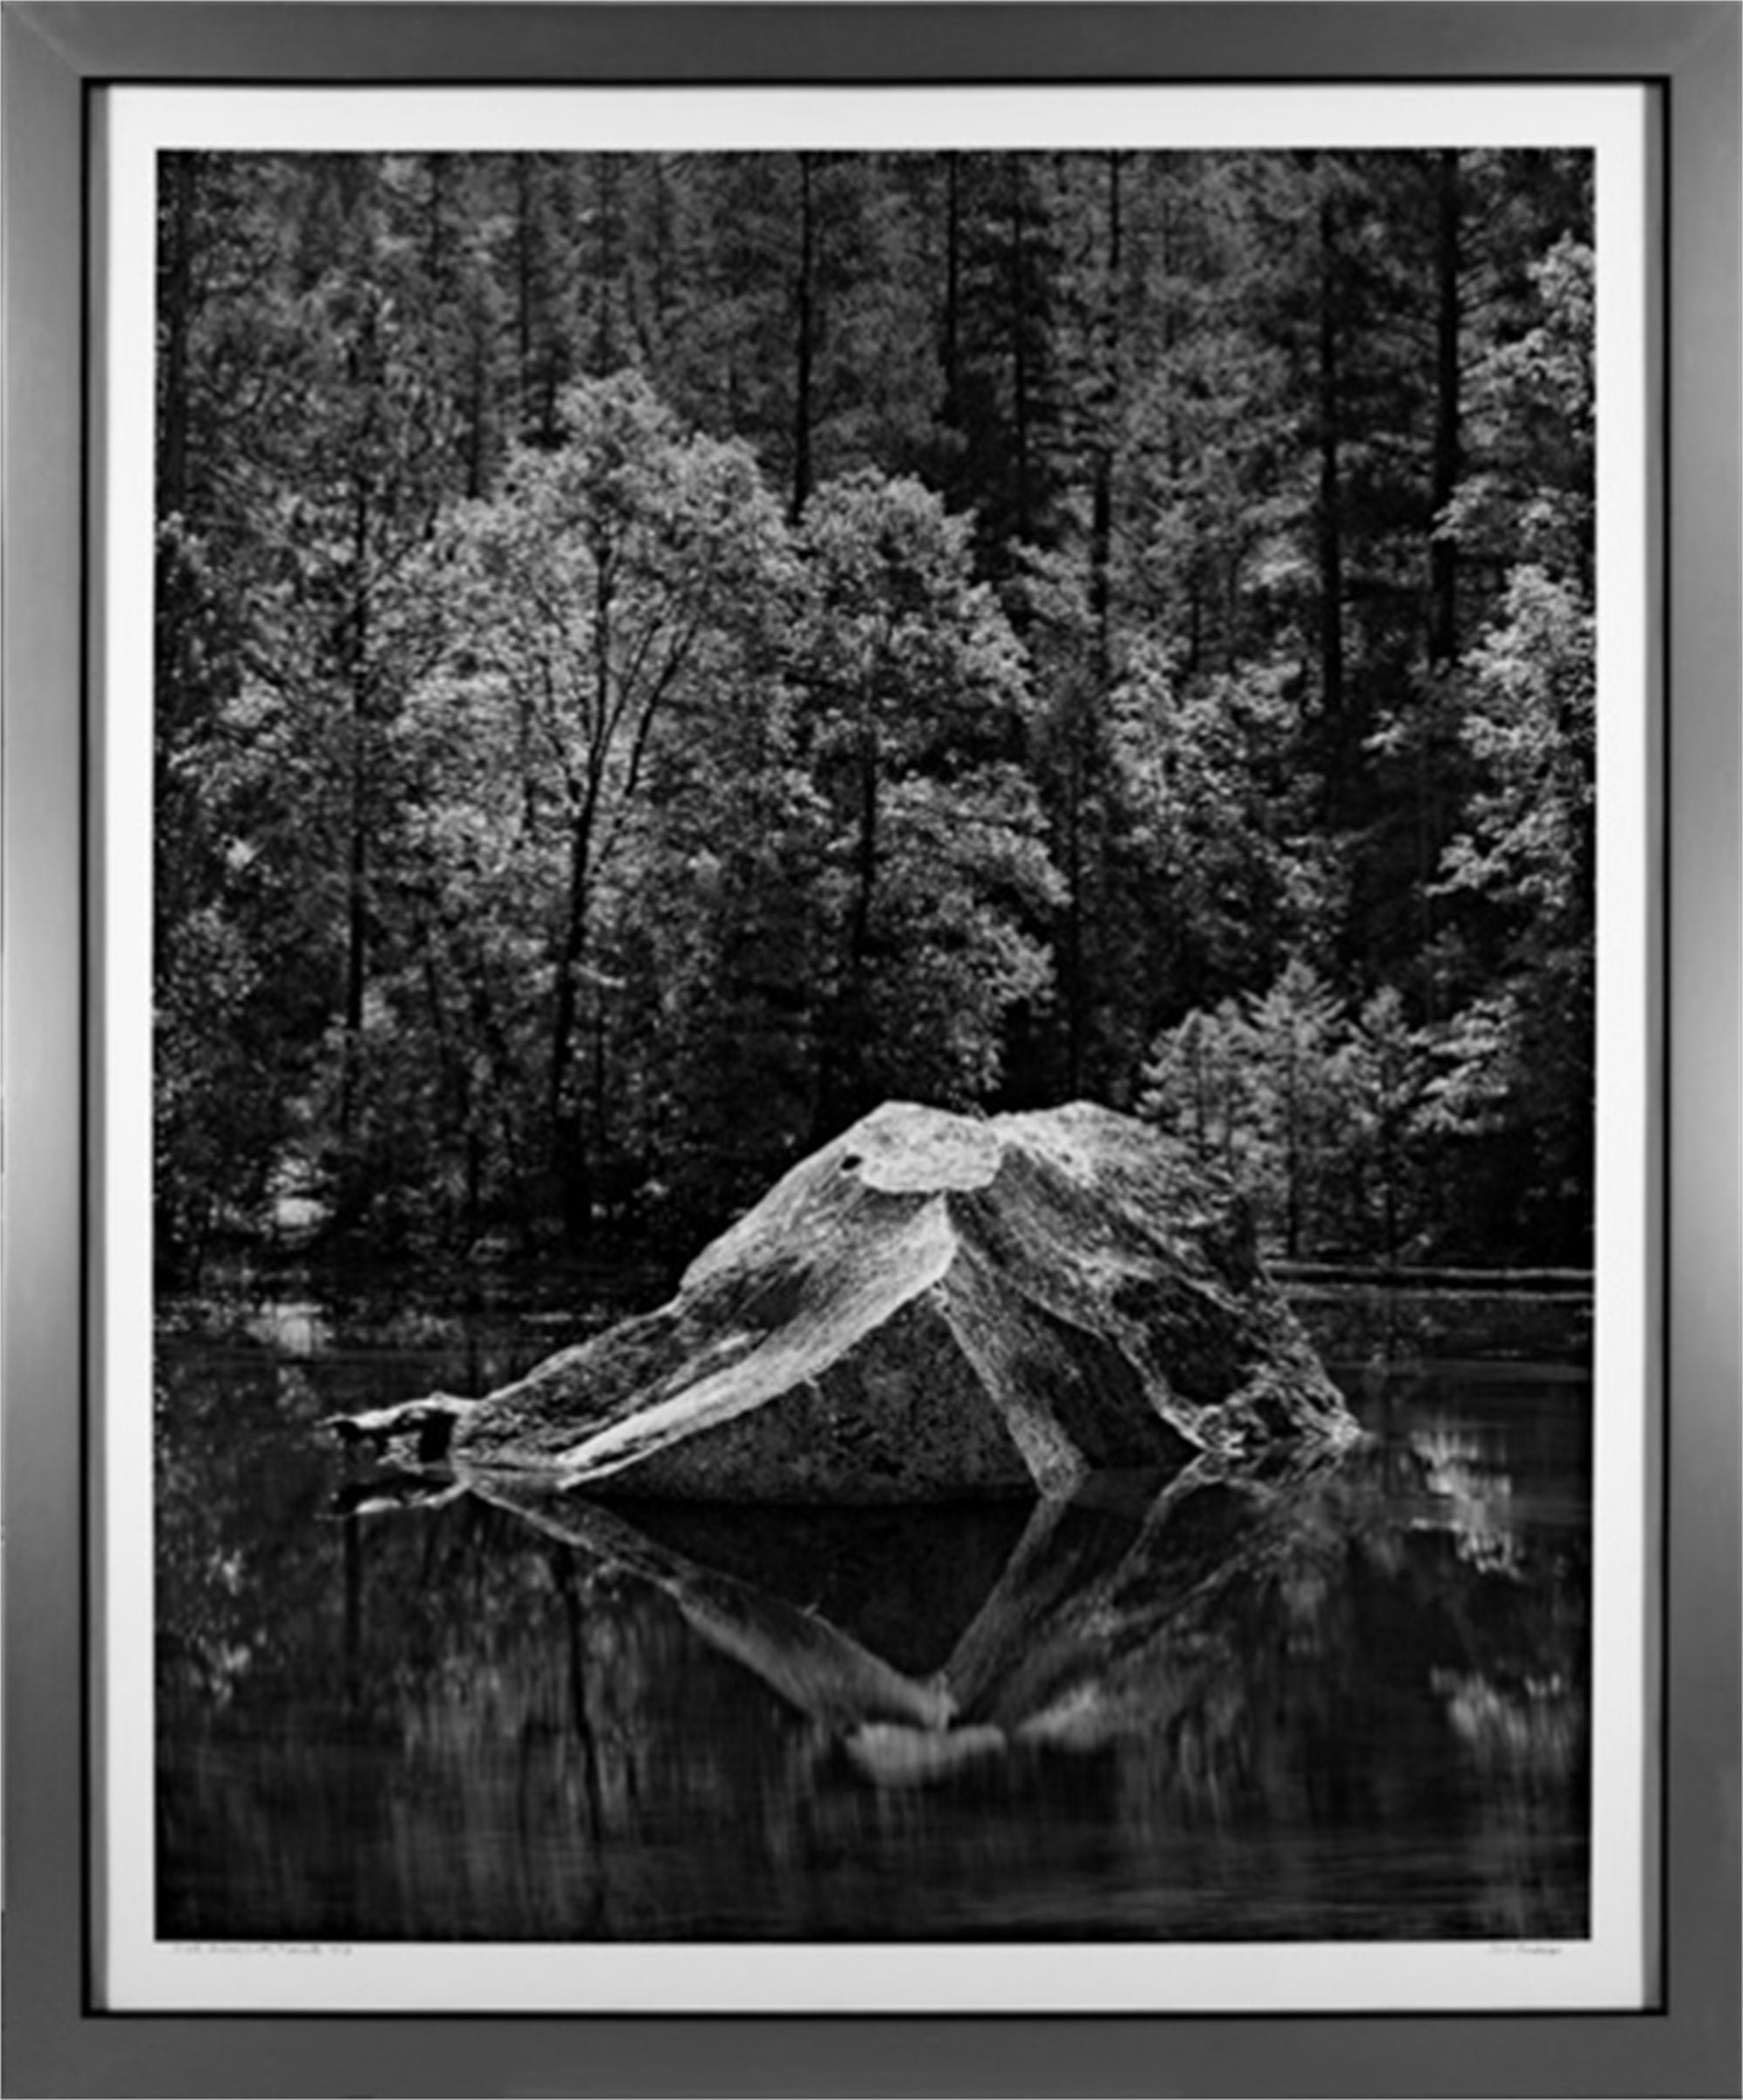 Rock, Mirror Lake, CA (Yosemite) by Thomas Ferderbar